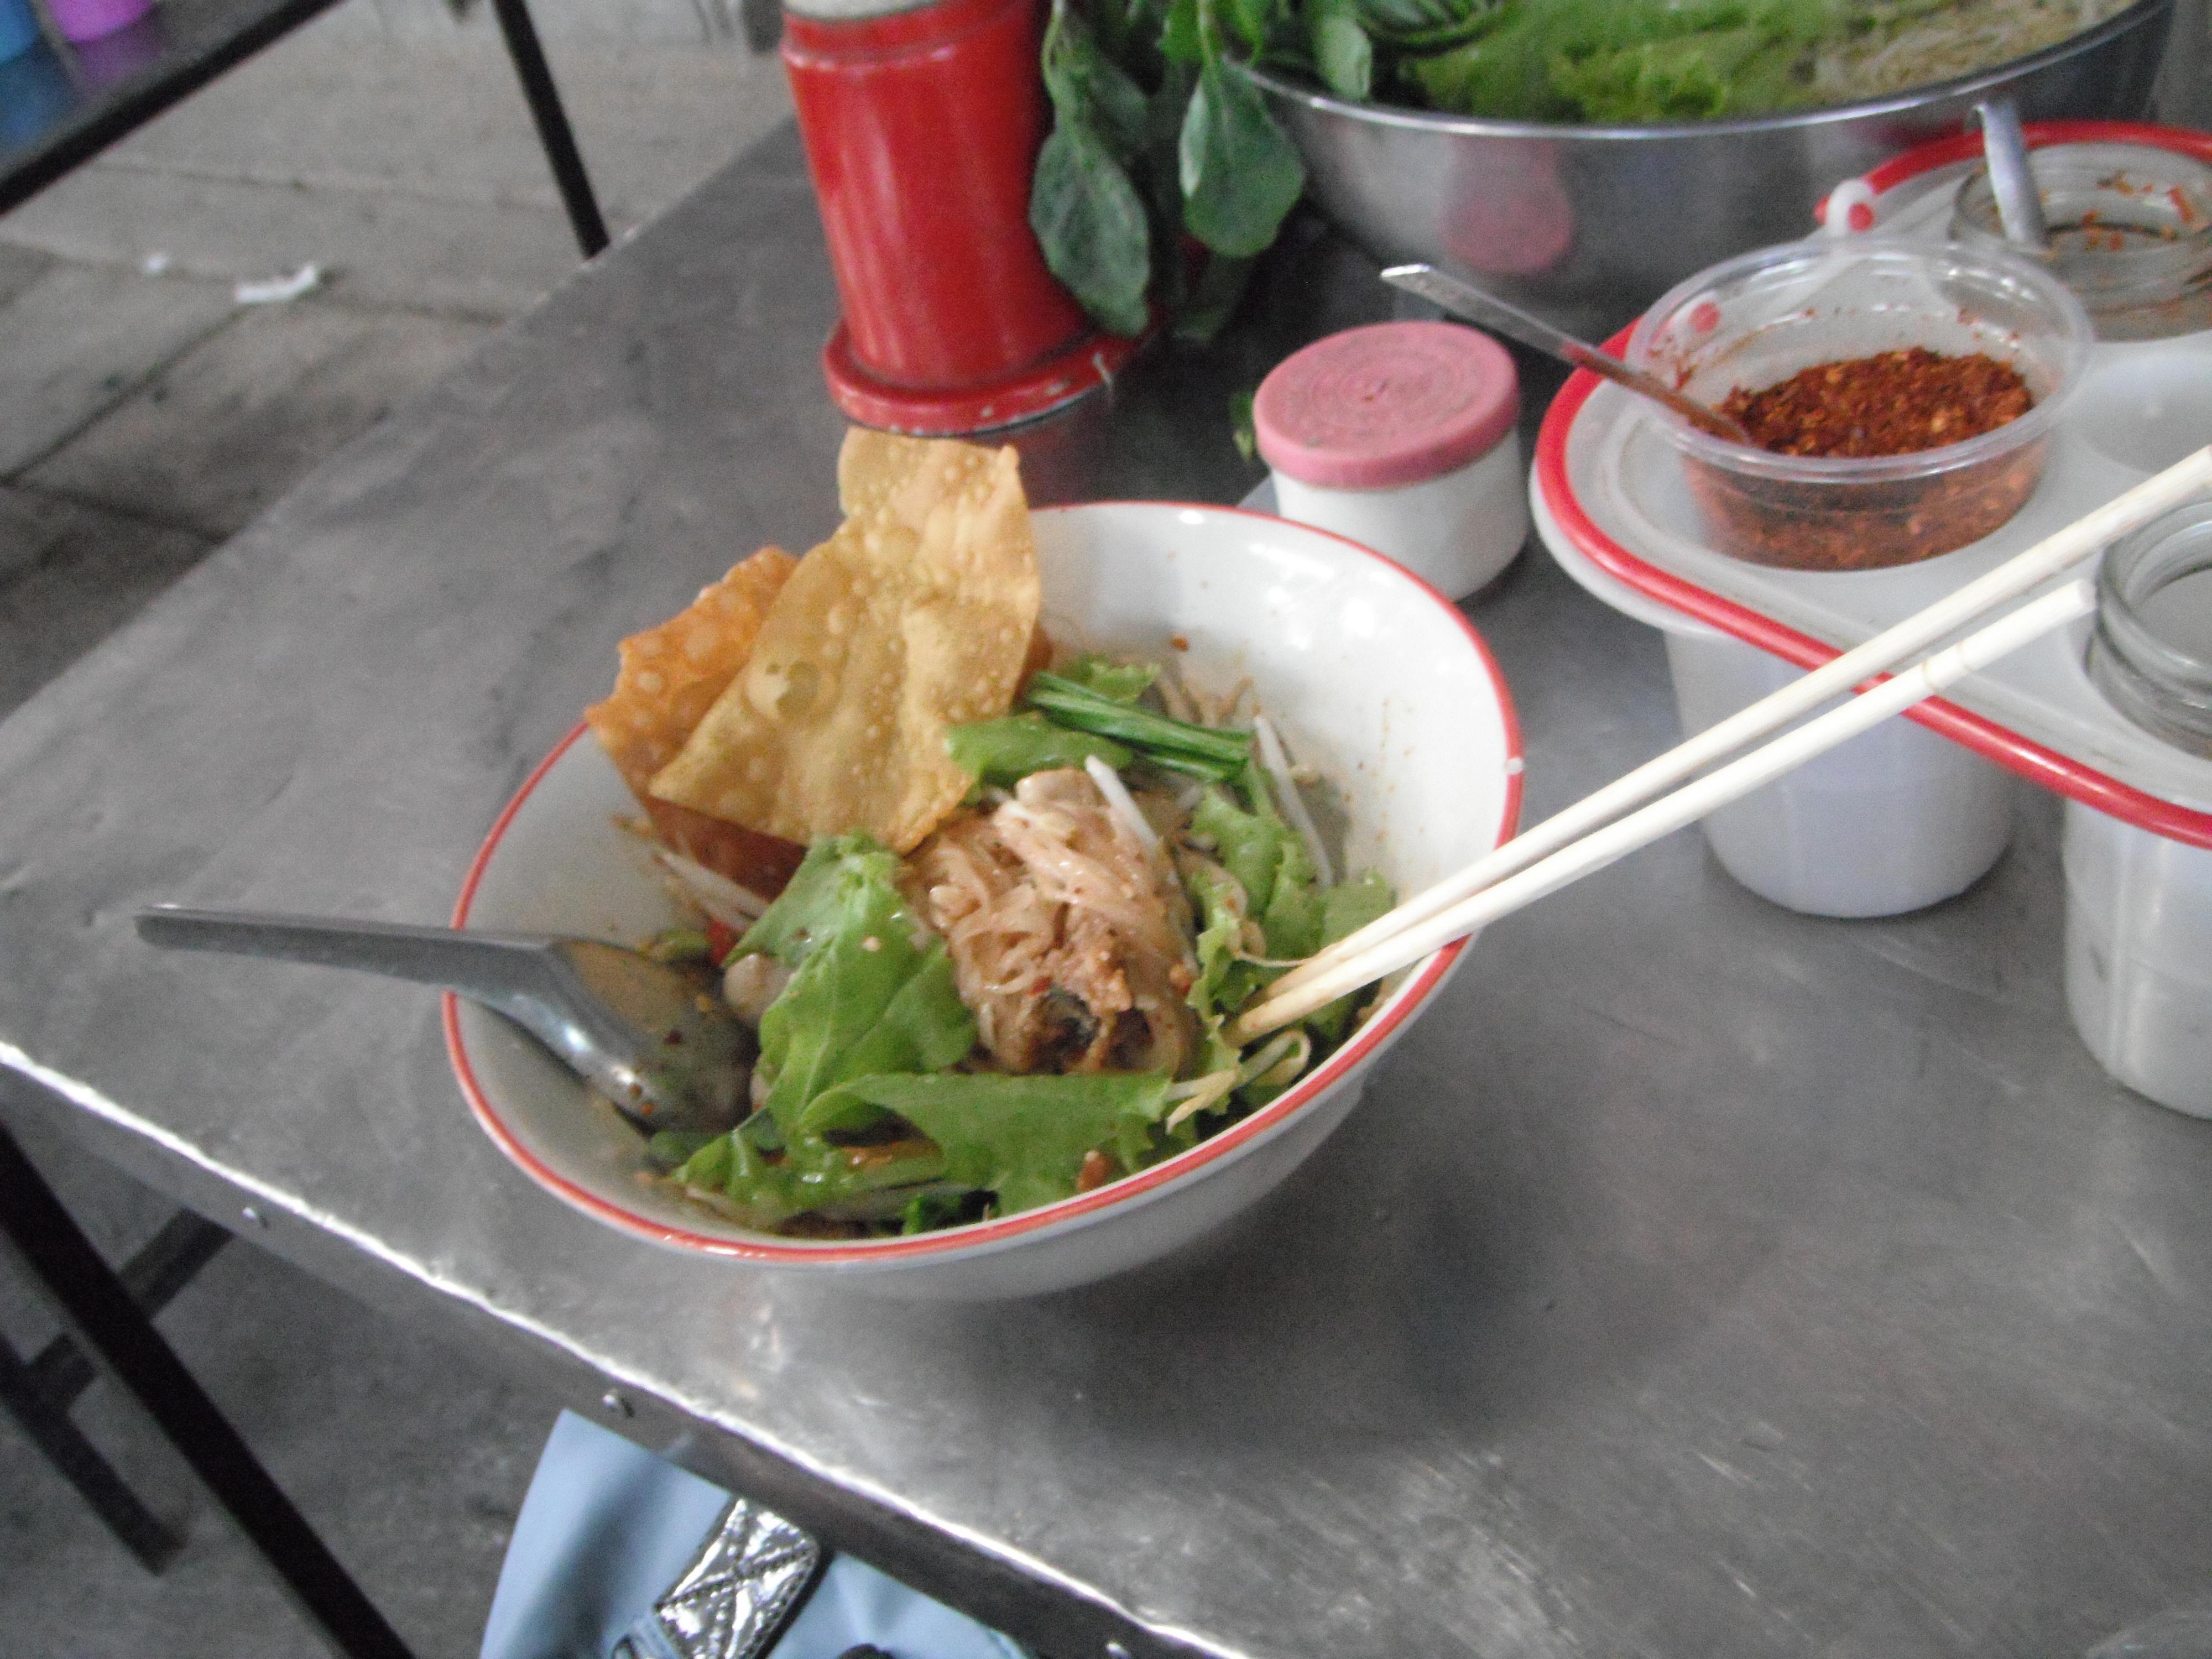 Cuisine II